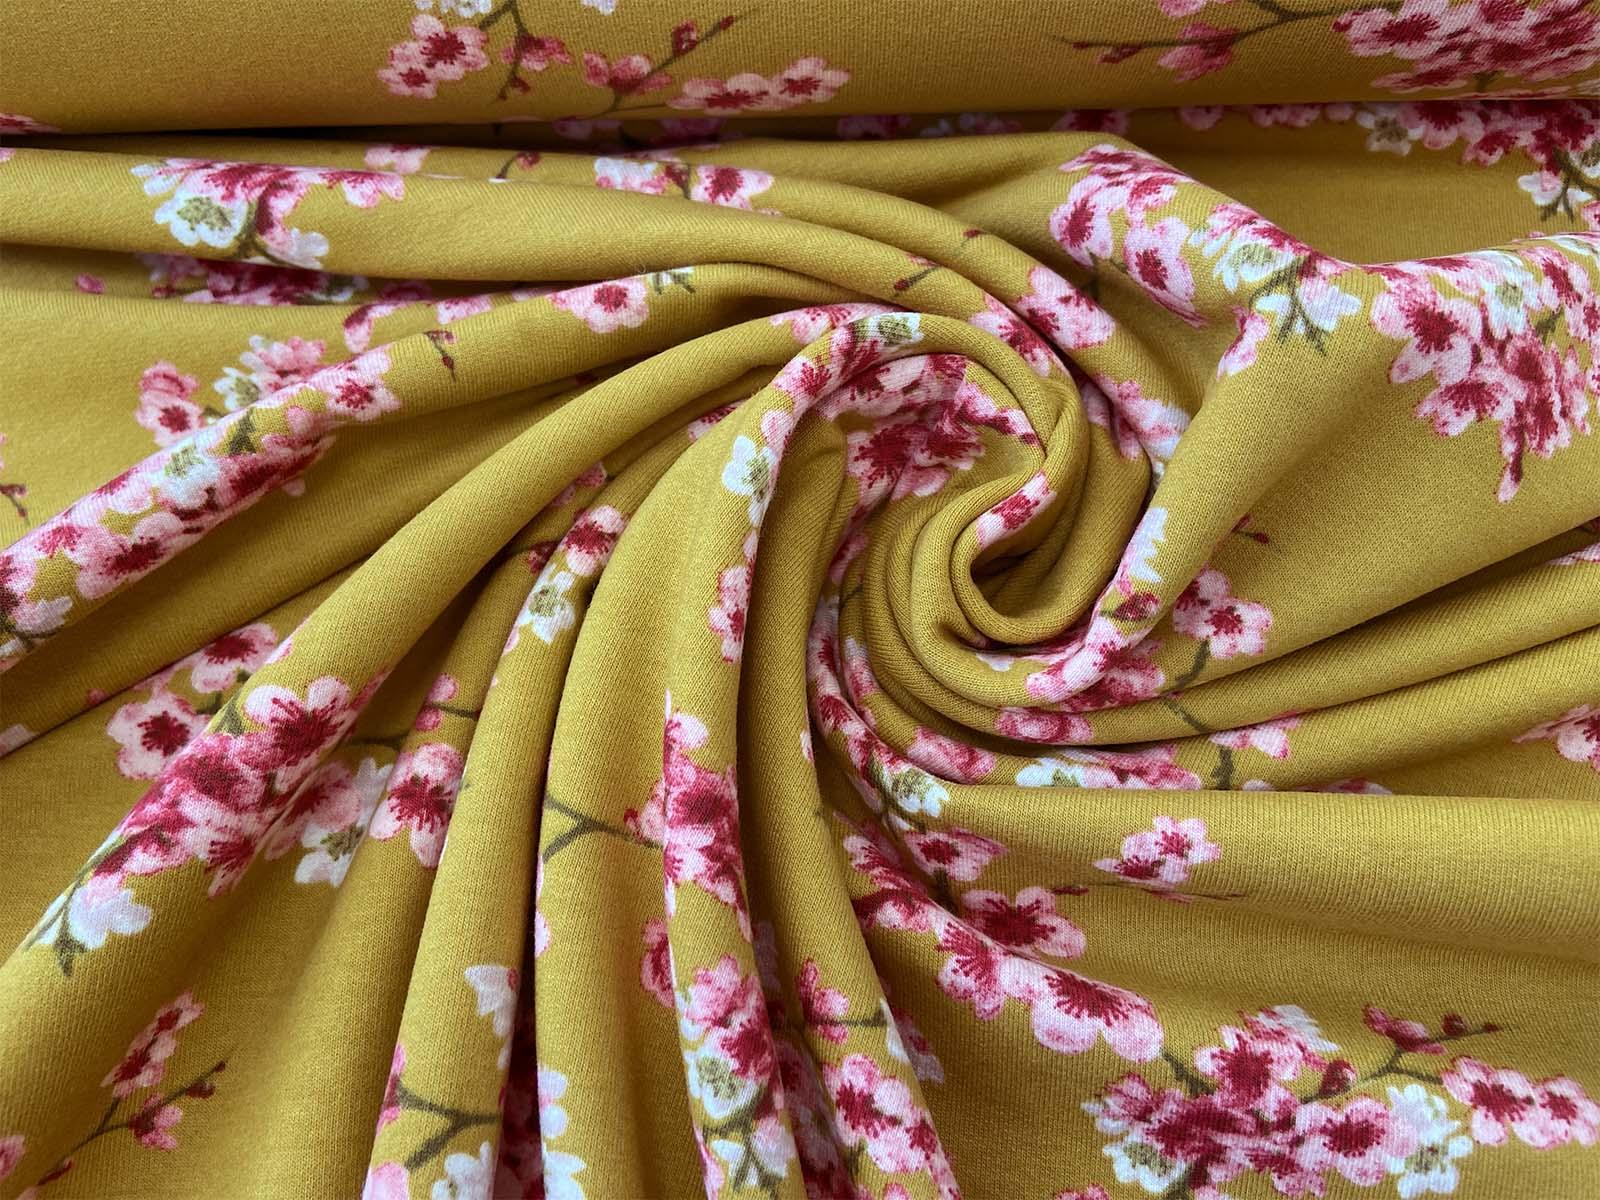 Bio-Sweat - Cherry Blossom gelb designed by Poppy